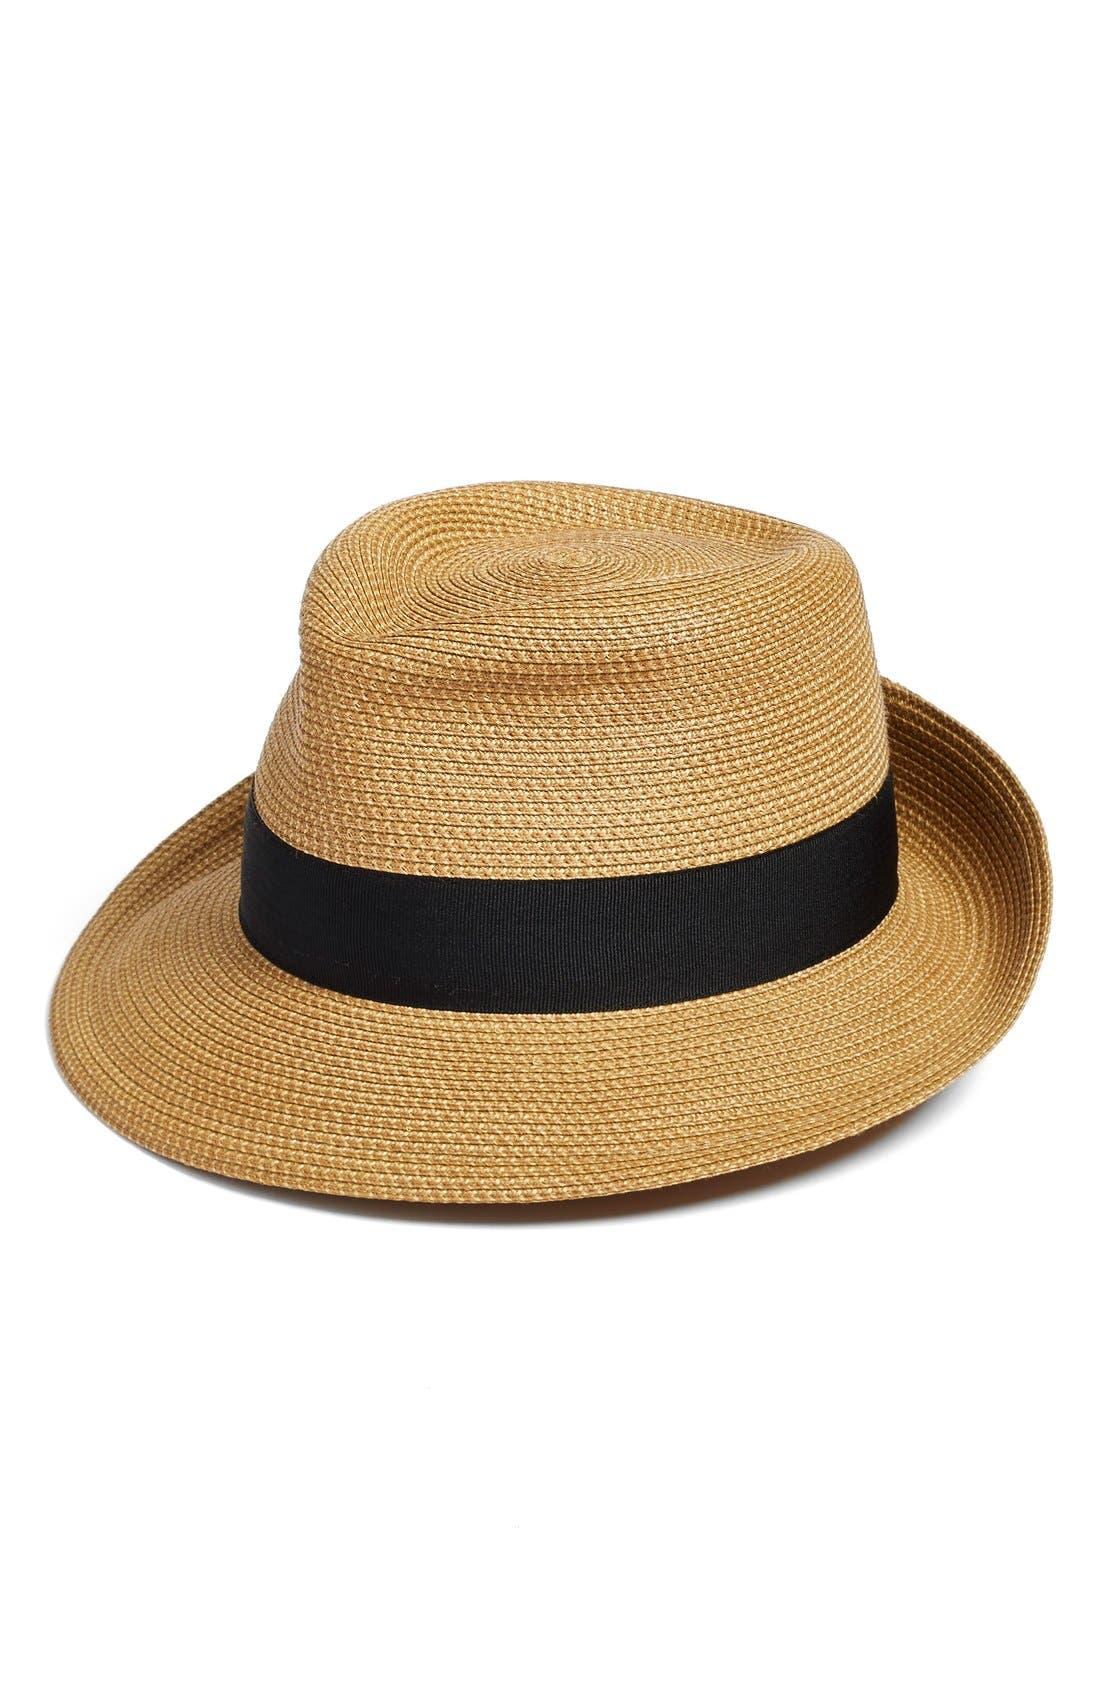 Eric Javits 'Classic' Squishee® Packable Fedora Sun Hat